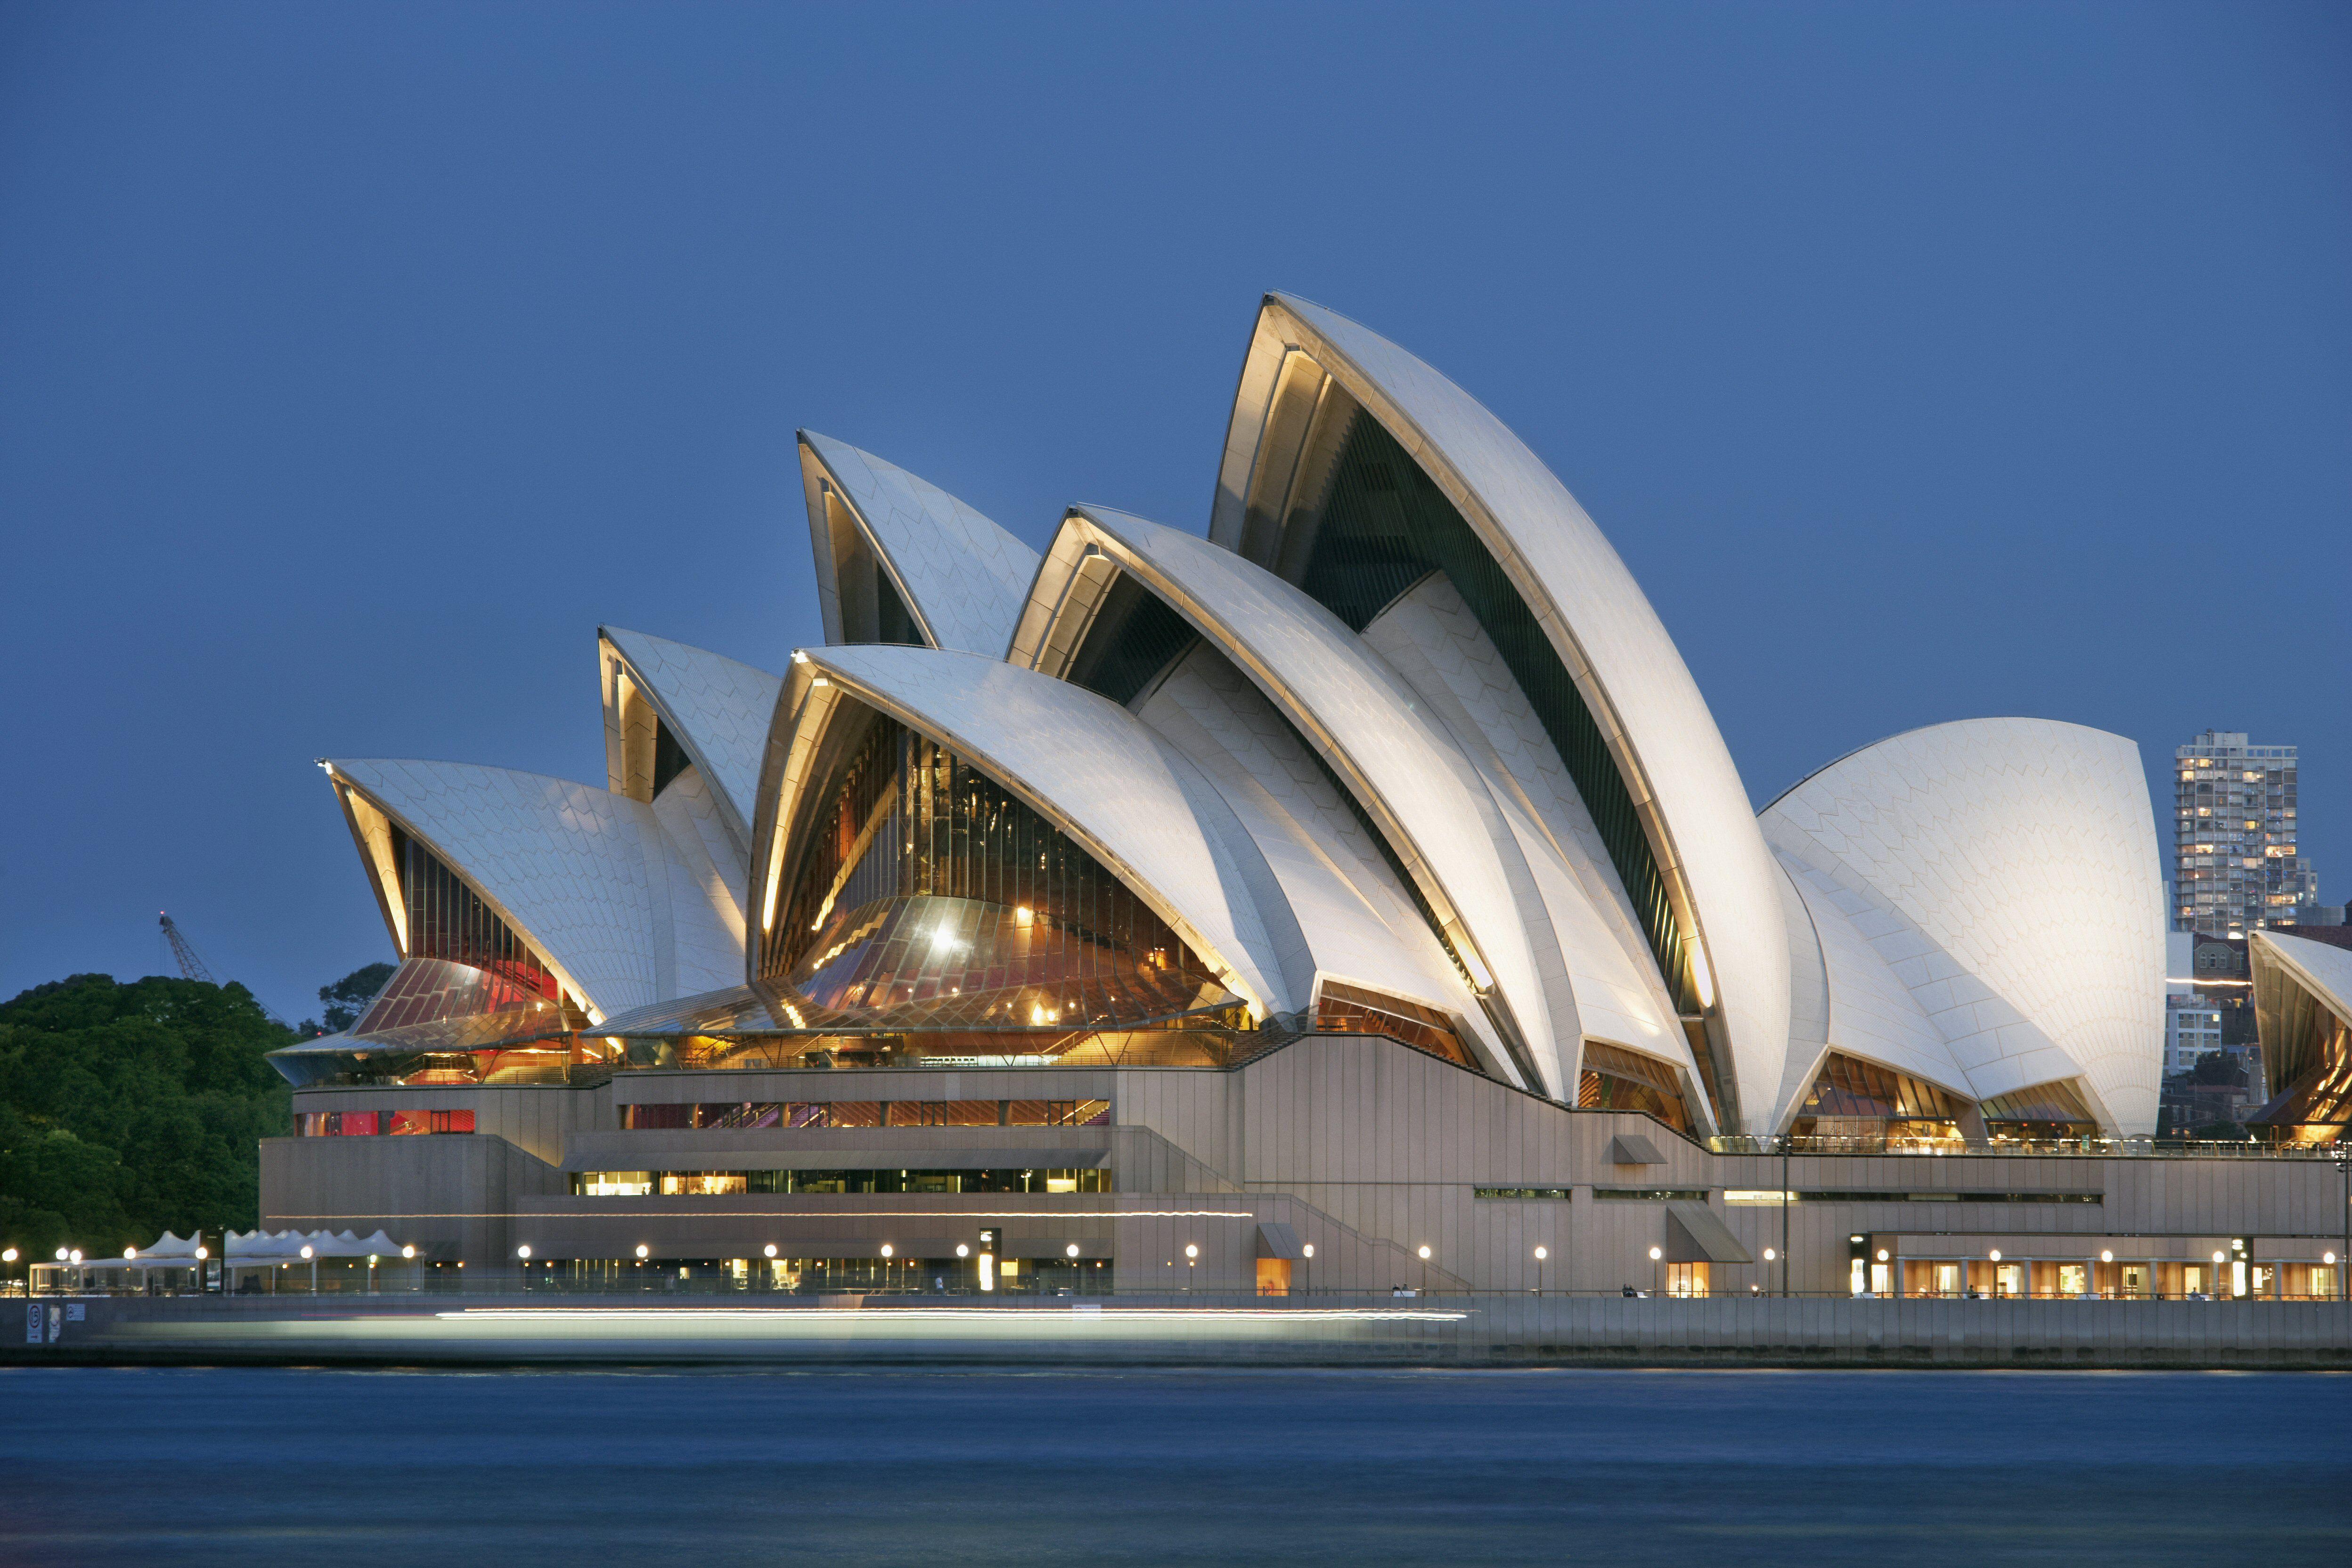 Sydney Opera House, Australia, at dusk